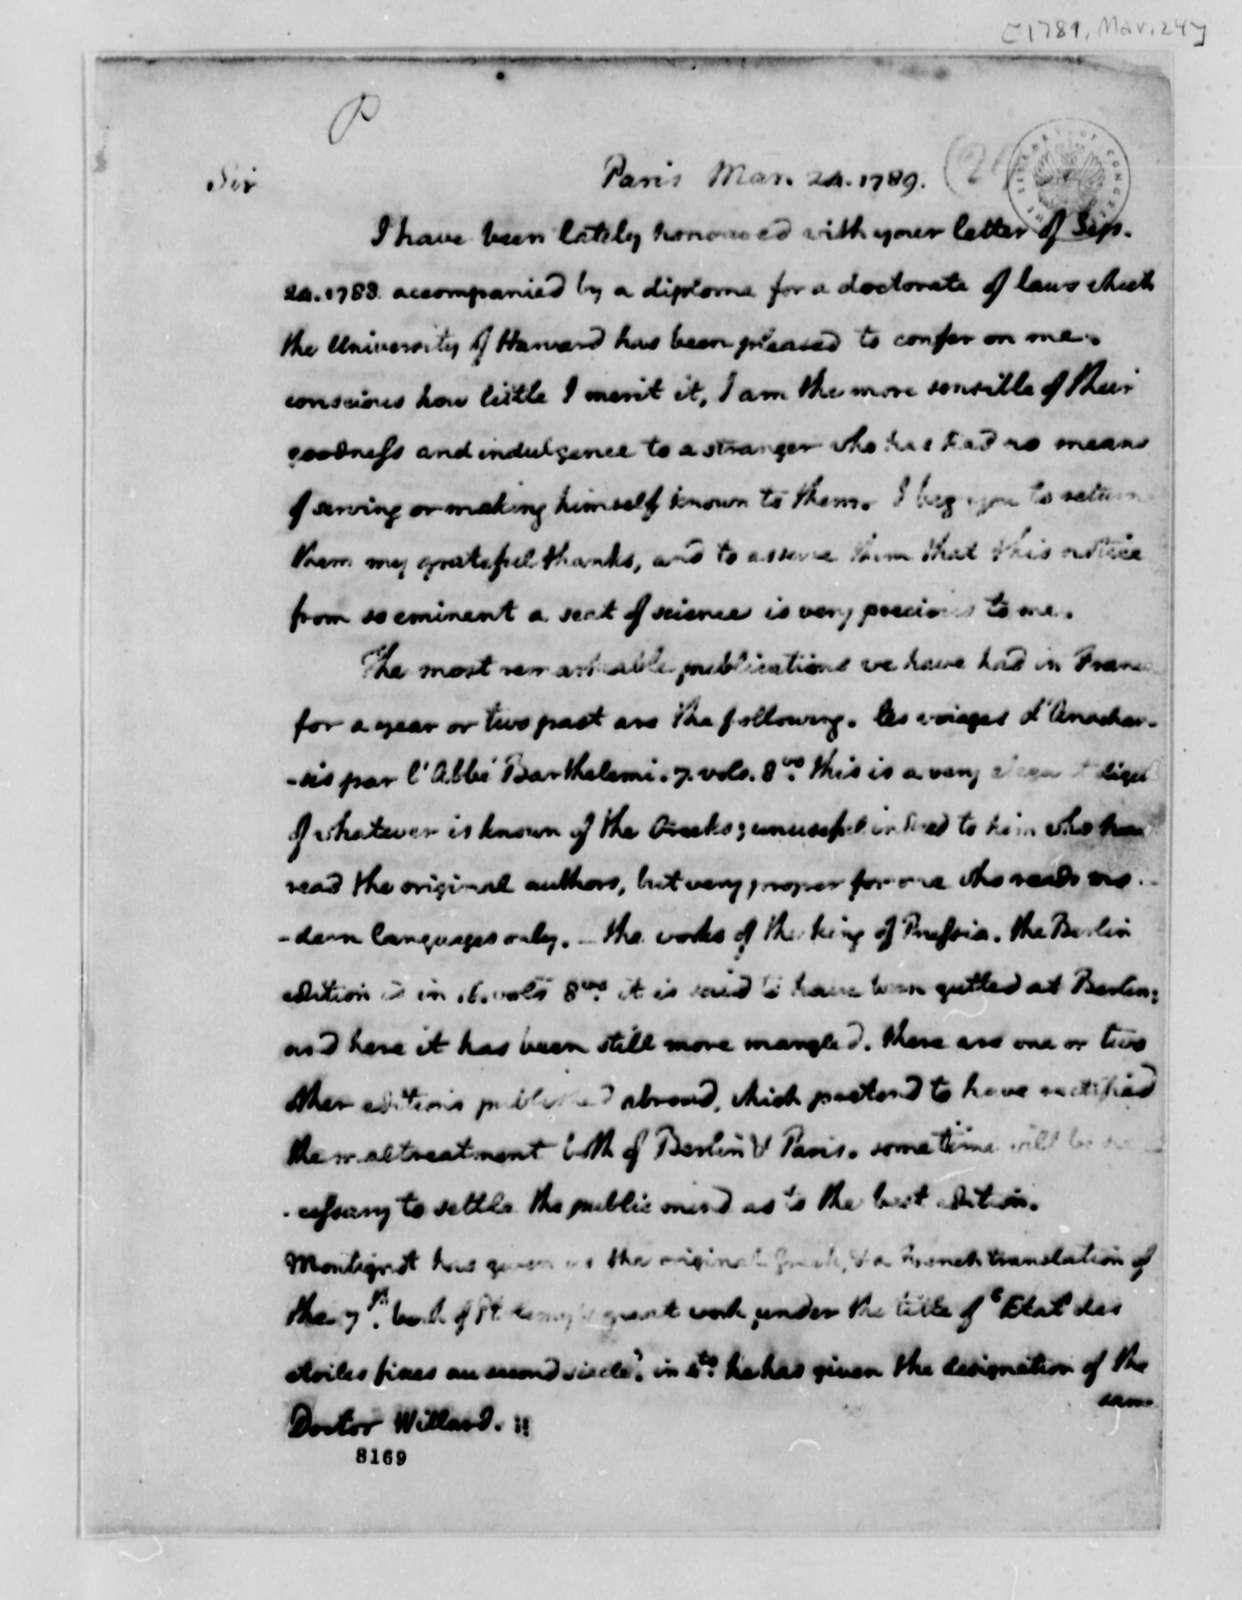 Thomas Jefferson to Joseph Willard, March 24, 1789